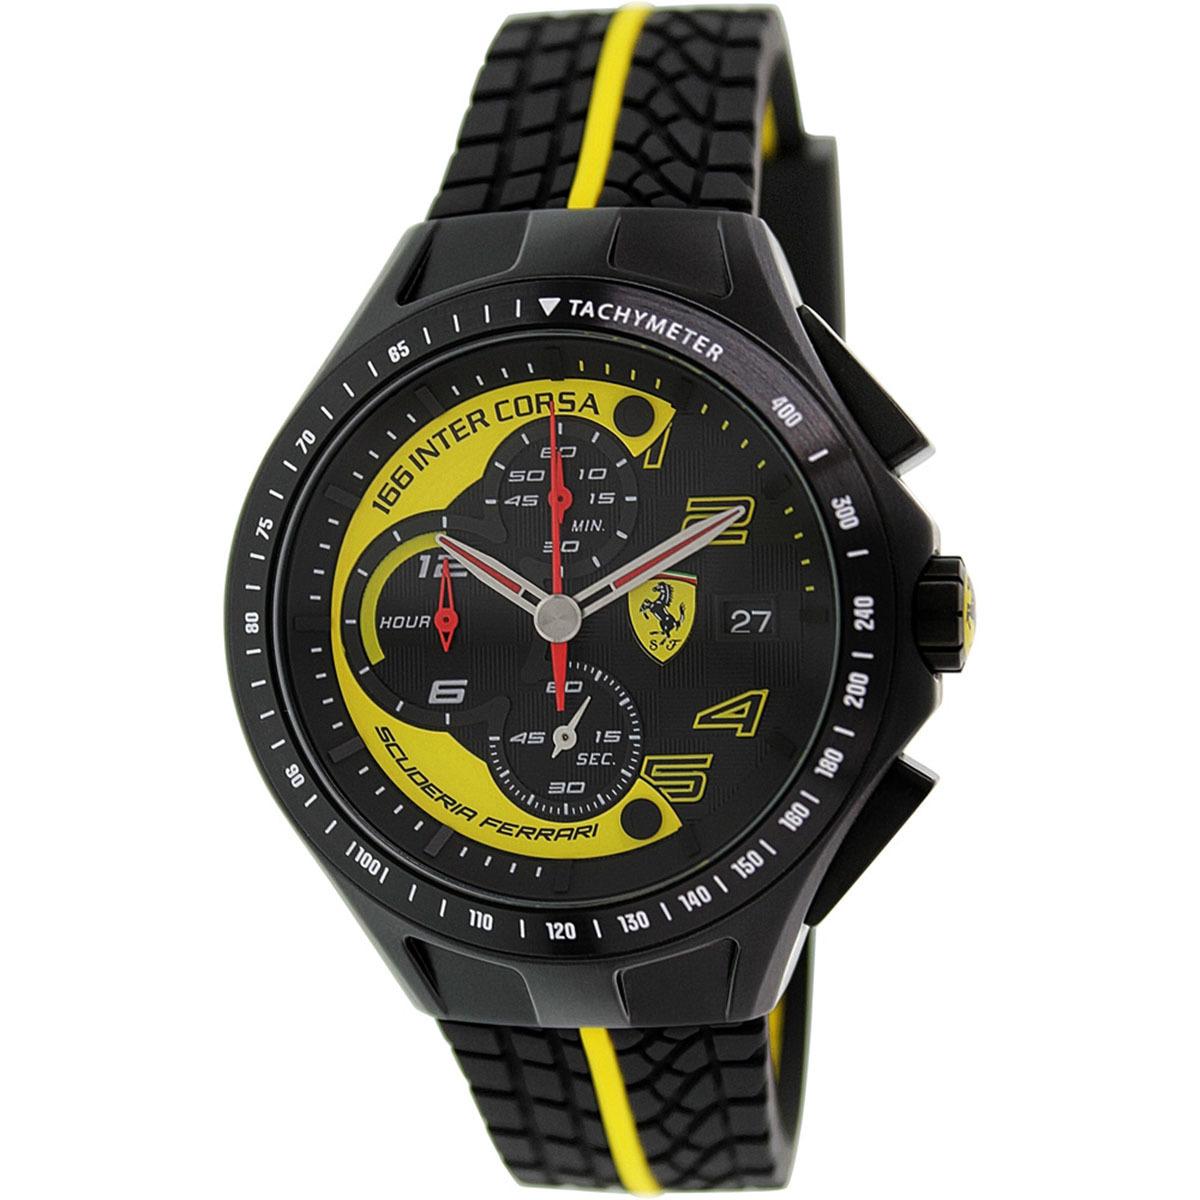 Spesifikasi Ferrari Mens Watch Nwt Garansi 0830078 Intl Yang Bagus Dan Murah